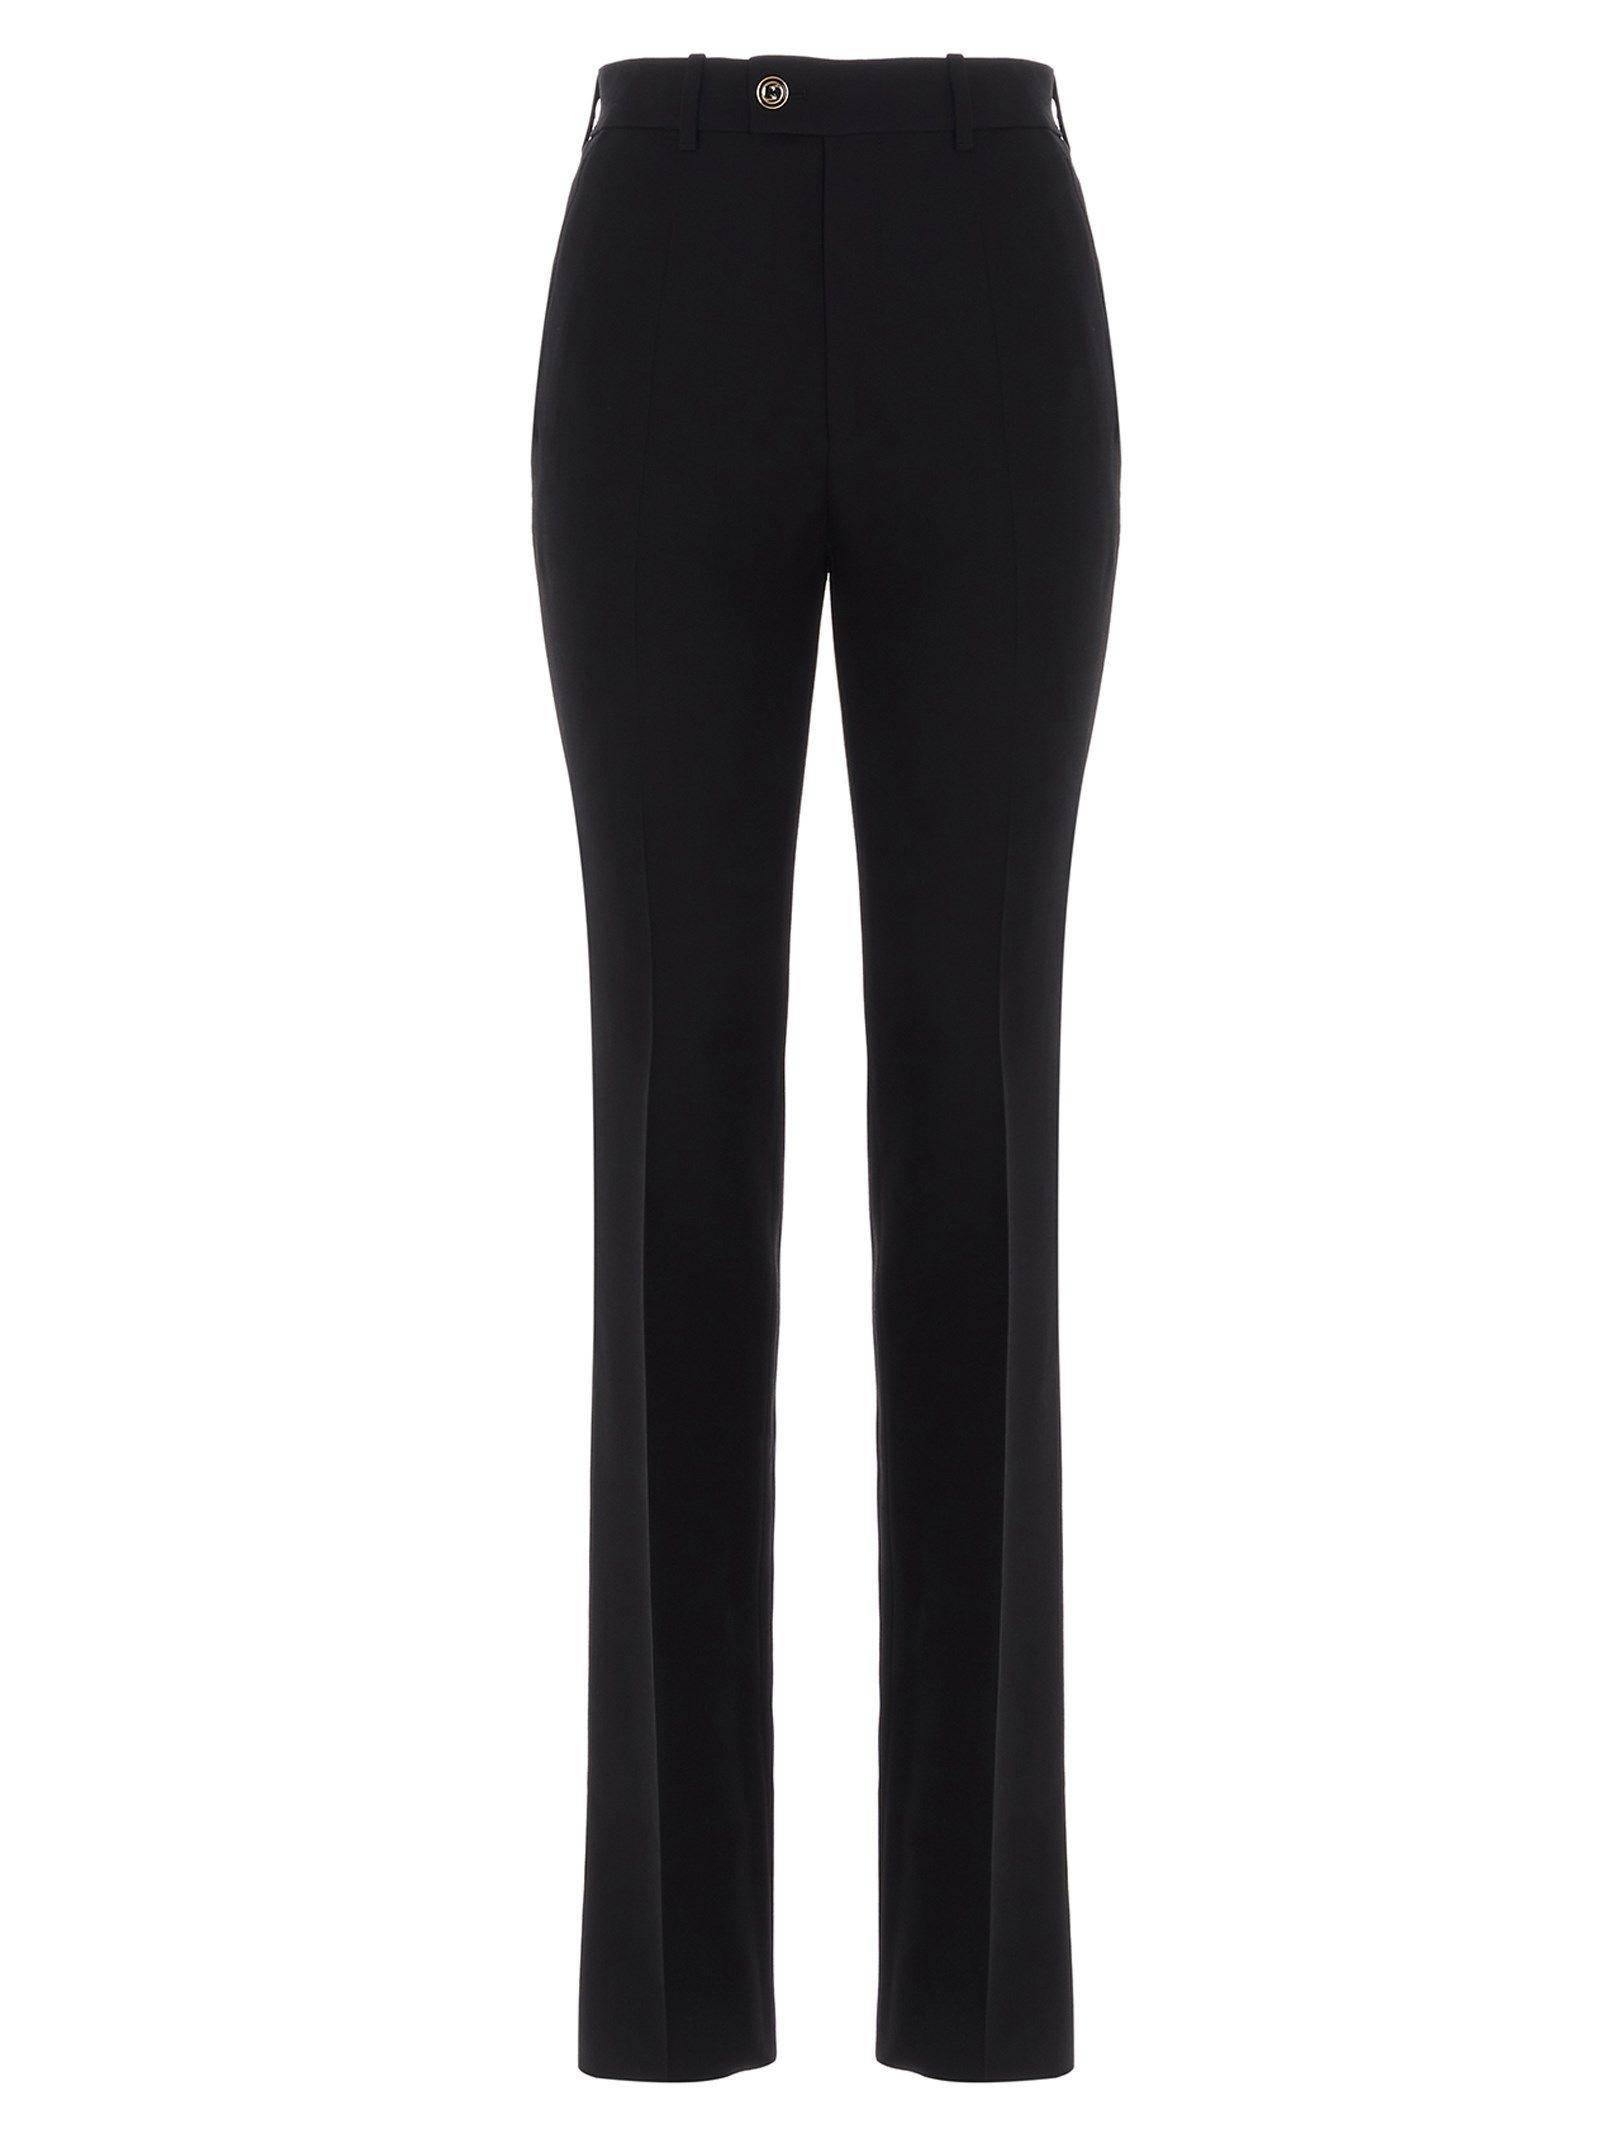 Gucci GUCCI WOMEN'S BLACK PANTS